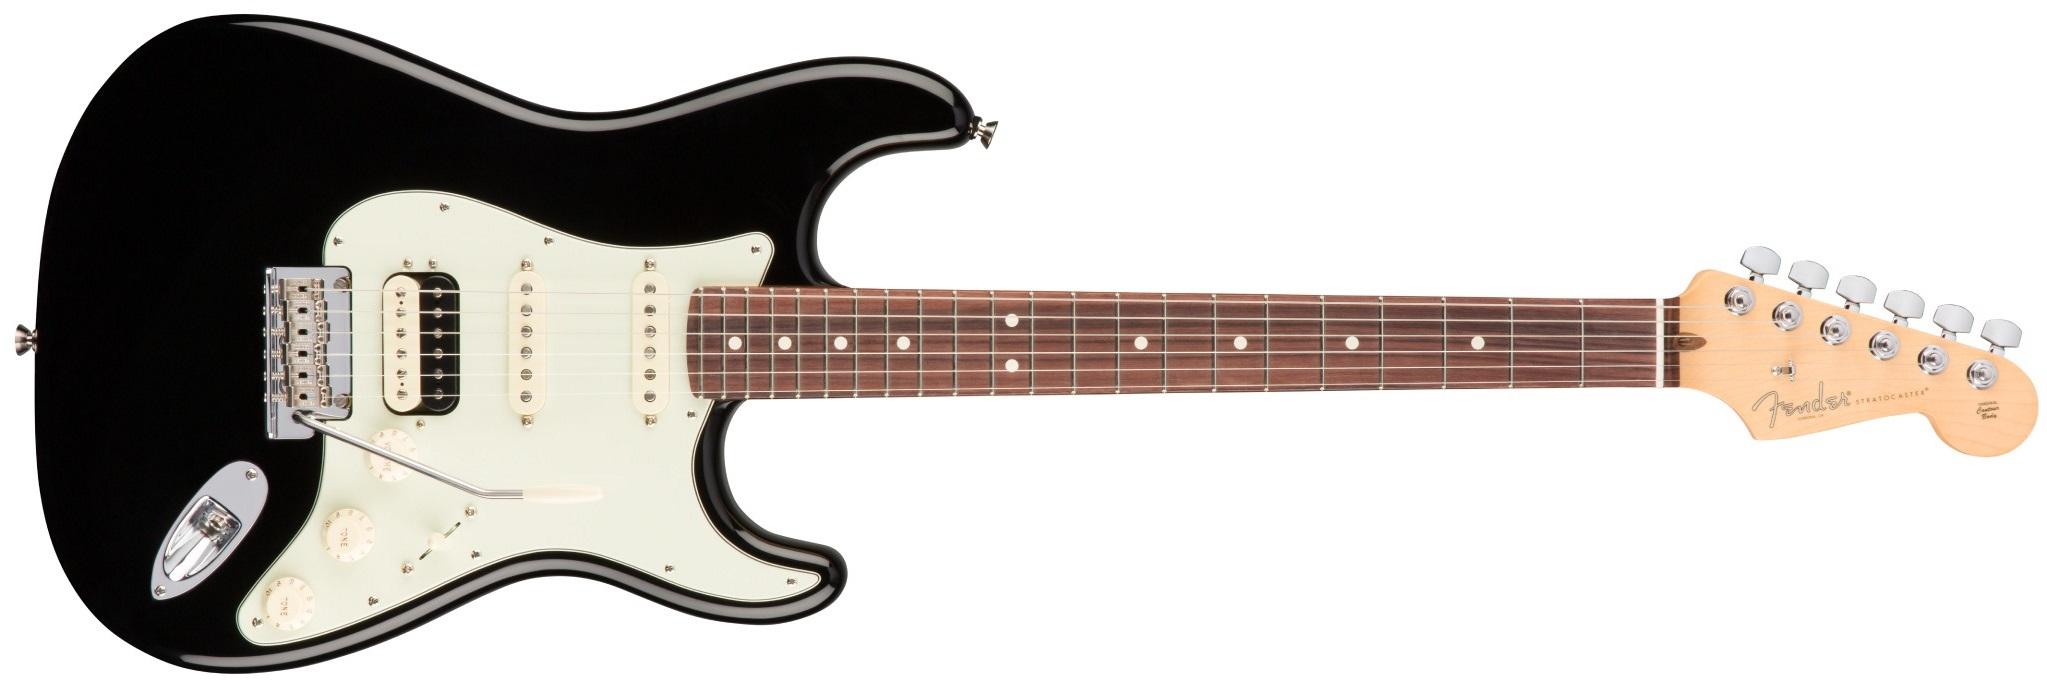 Fender American Pro Stratocaster HSS Shawbuckers RW BK